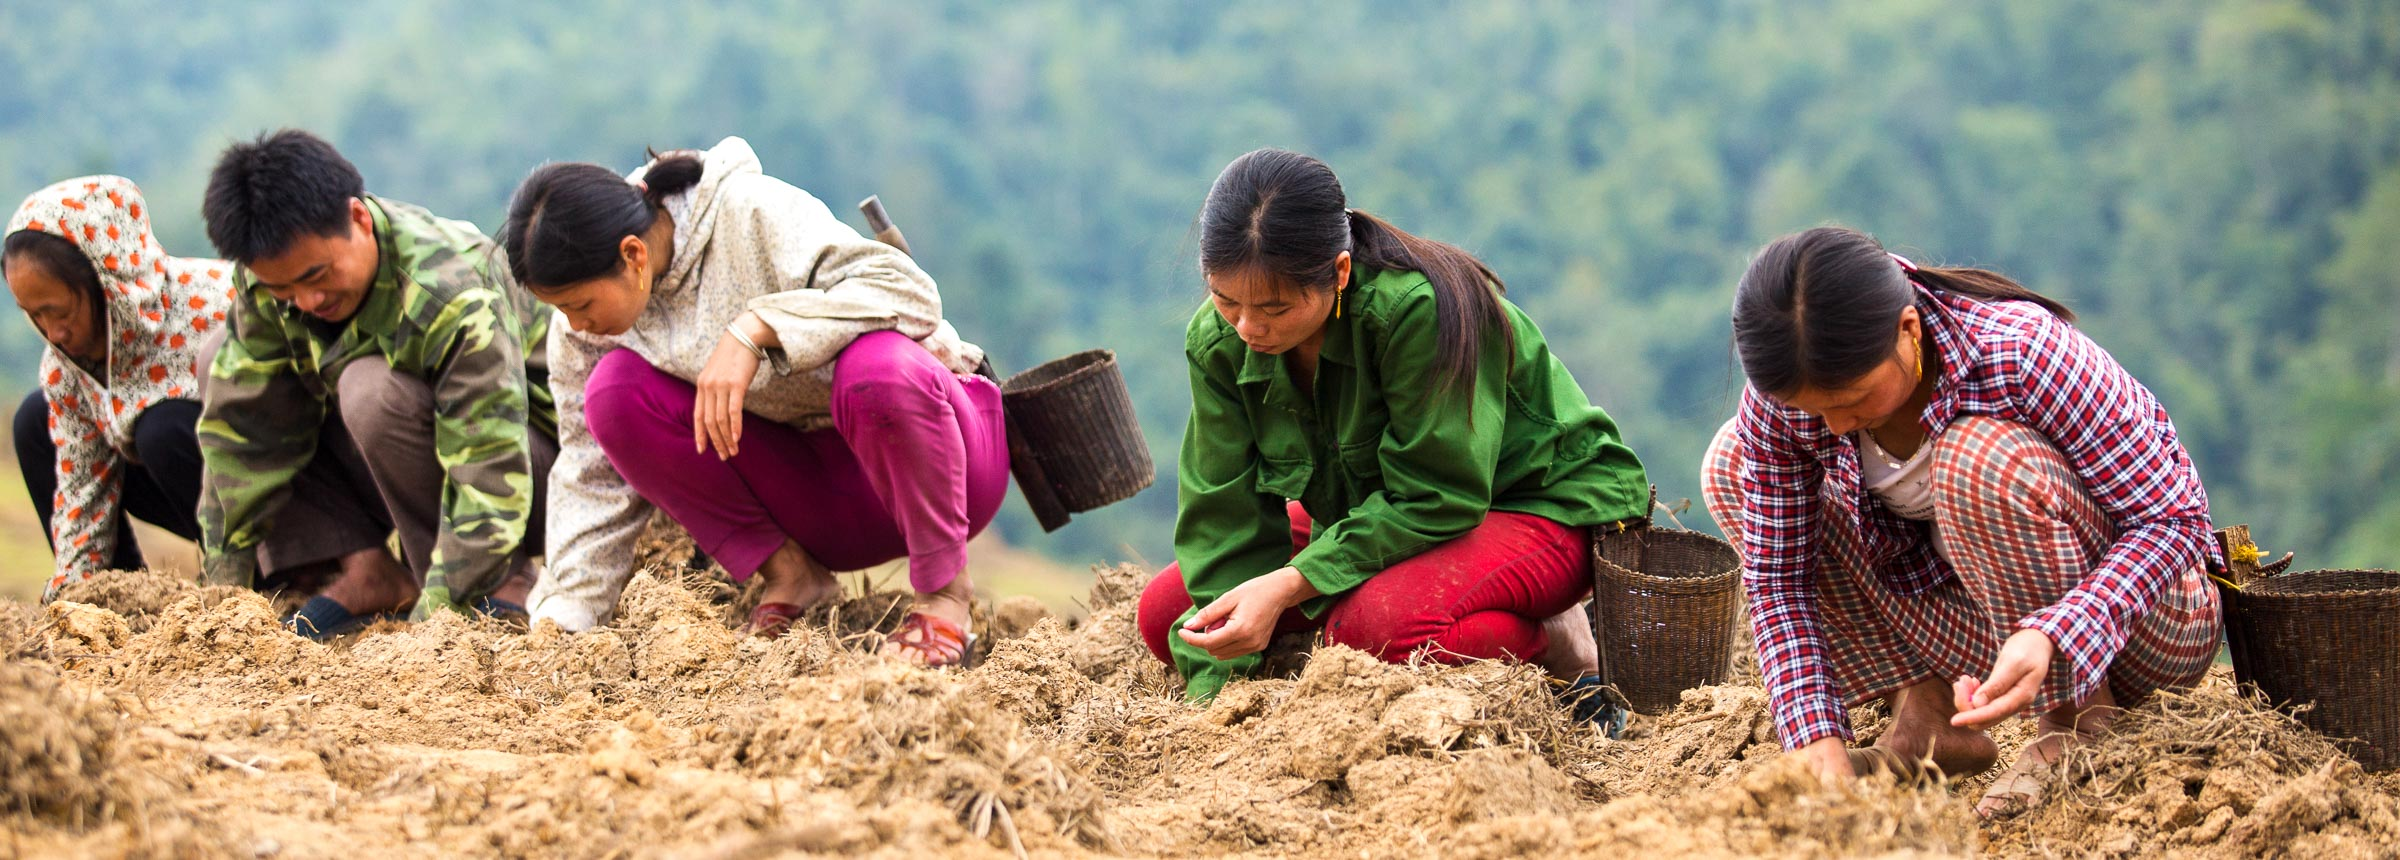 People planting seeds